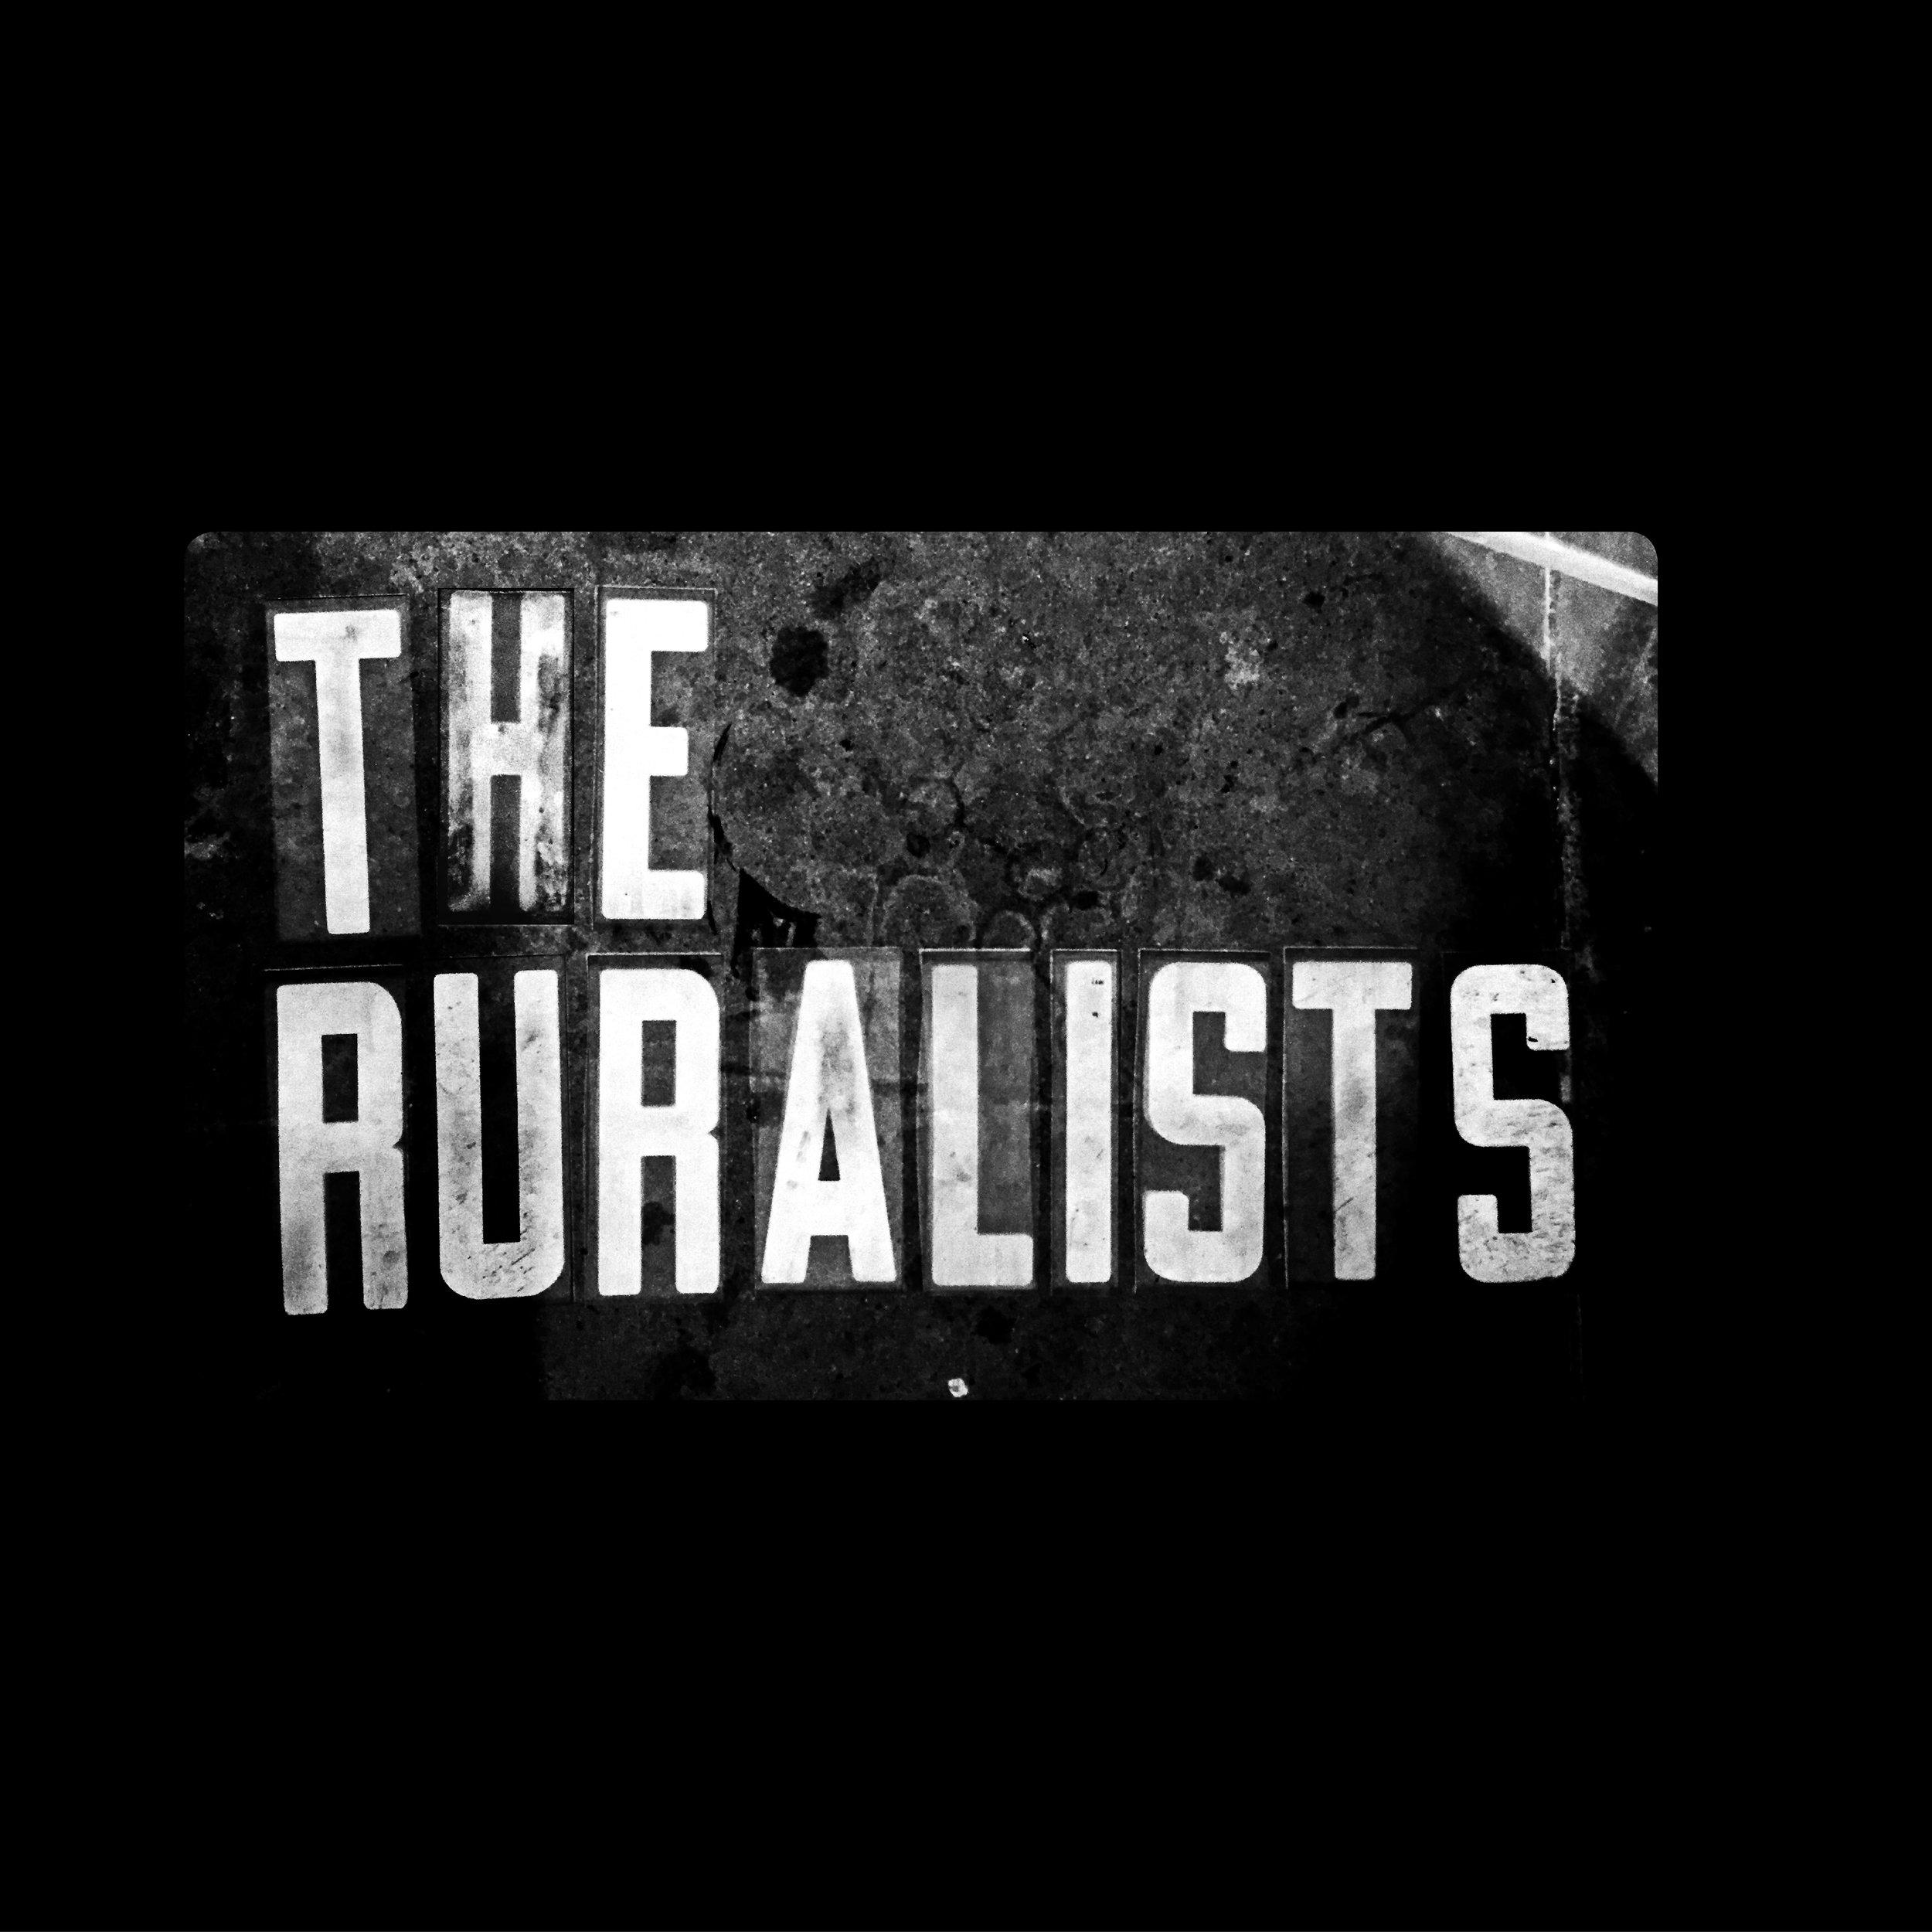 ruralists_cover.jpg